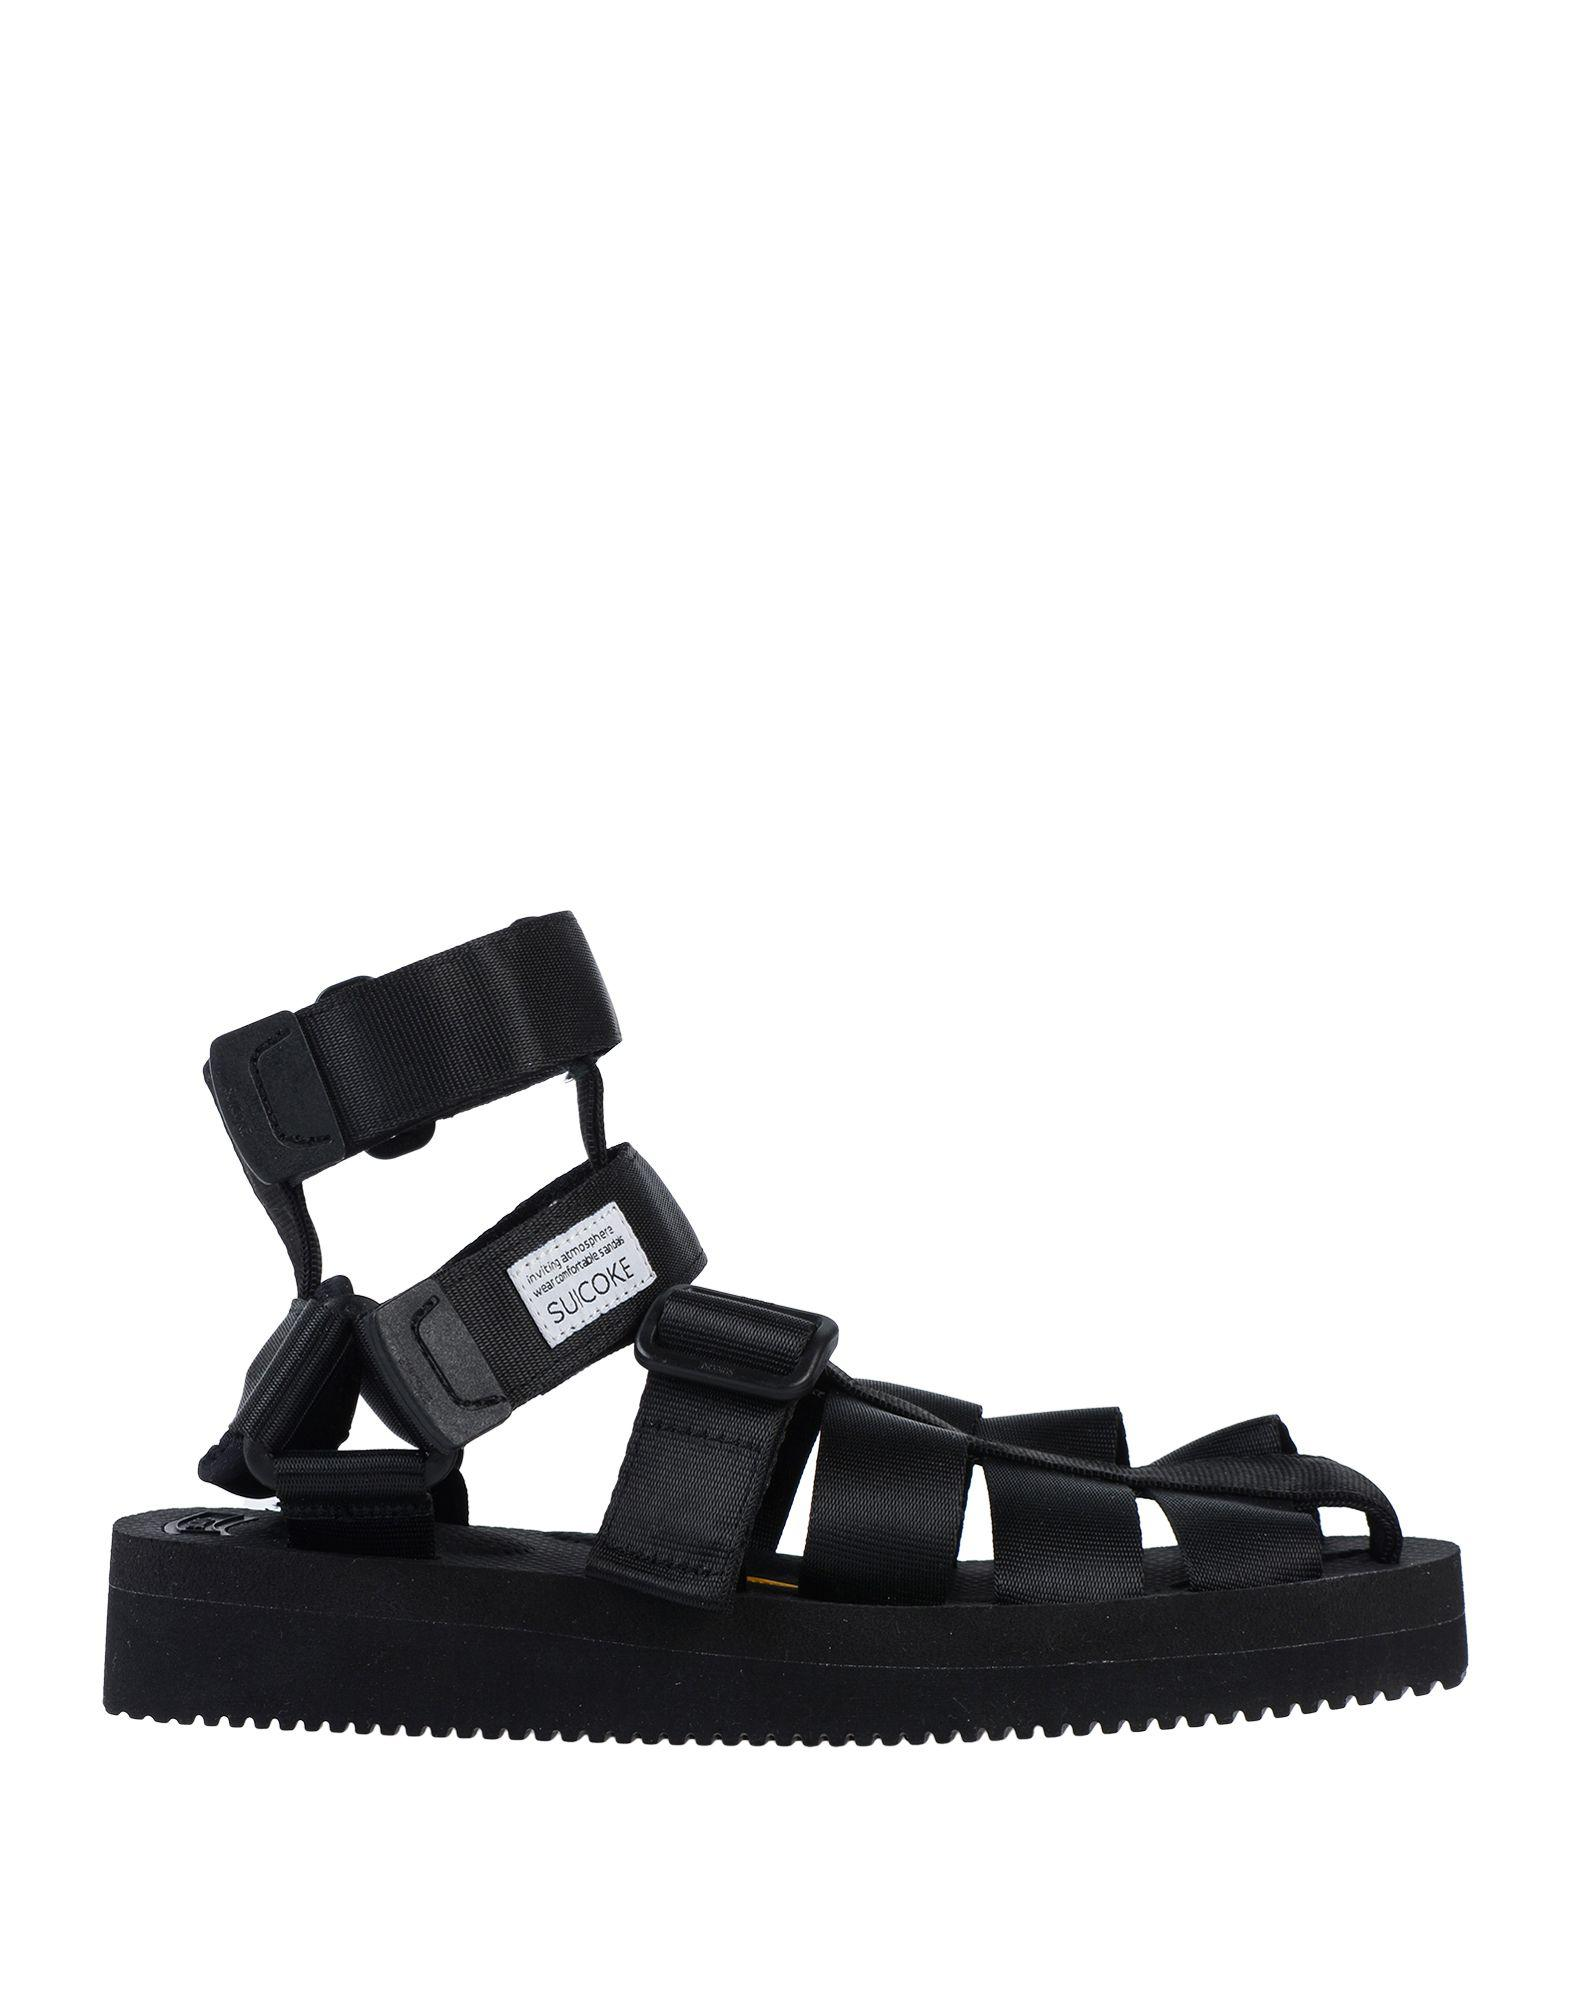 571fd1e6fa5 Suicoke - Black Sandals - Lyst. View fullscreen